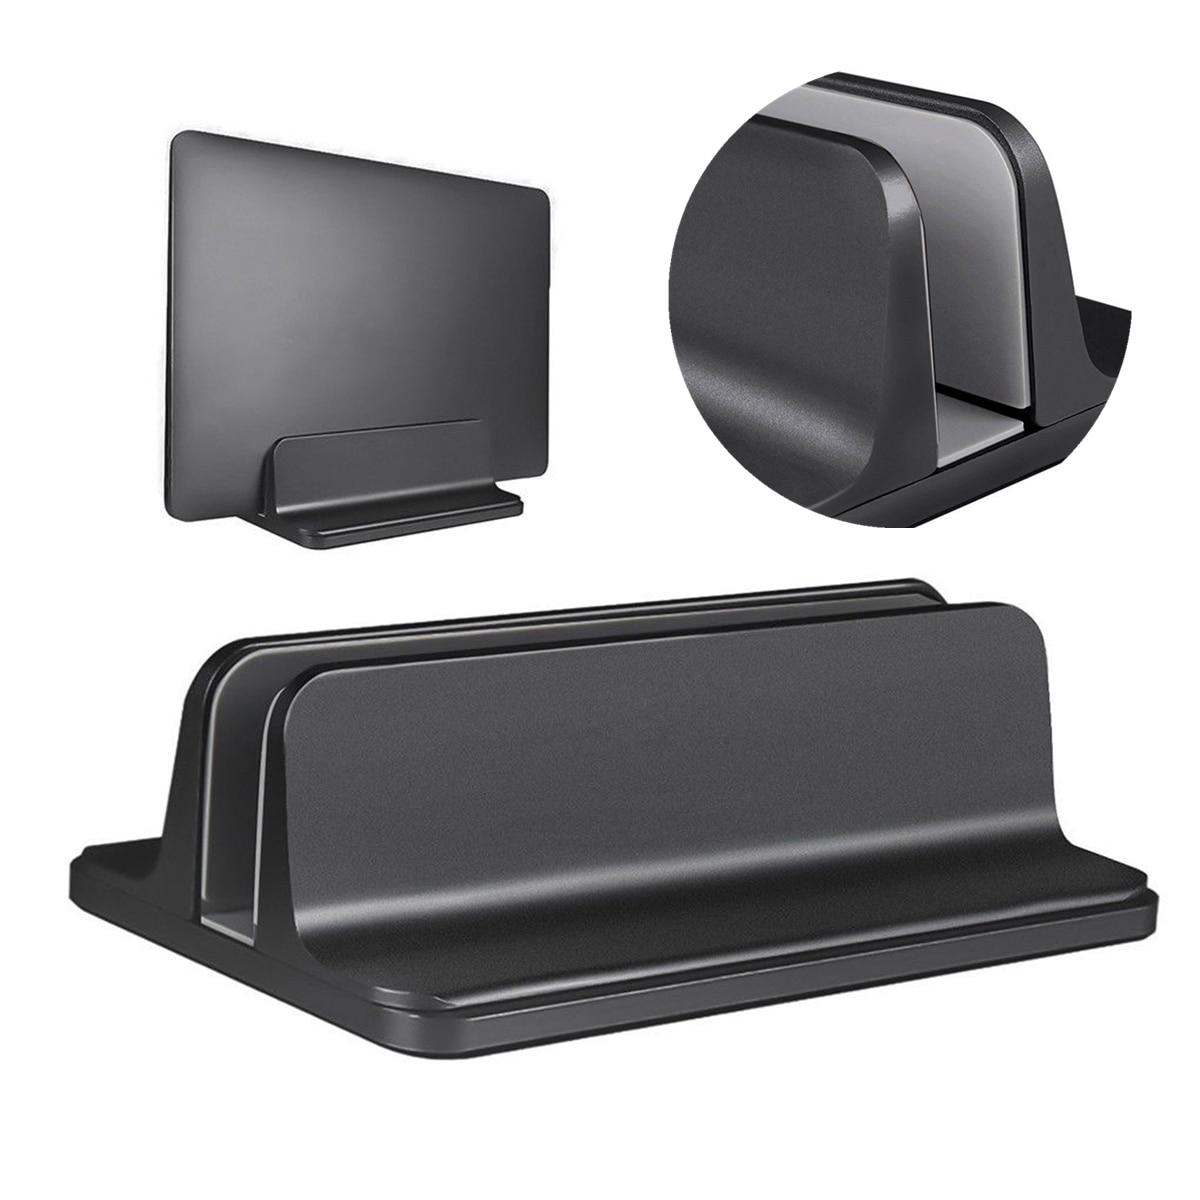 Aluminum Alloy Vertical Laptop Stand Adjustable Desktop Notebook Computer Holder Tablet Rack Organizer Accessories Black